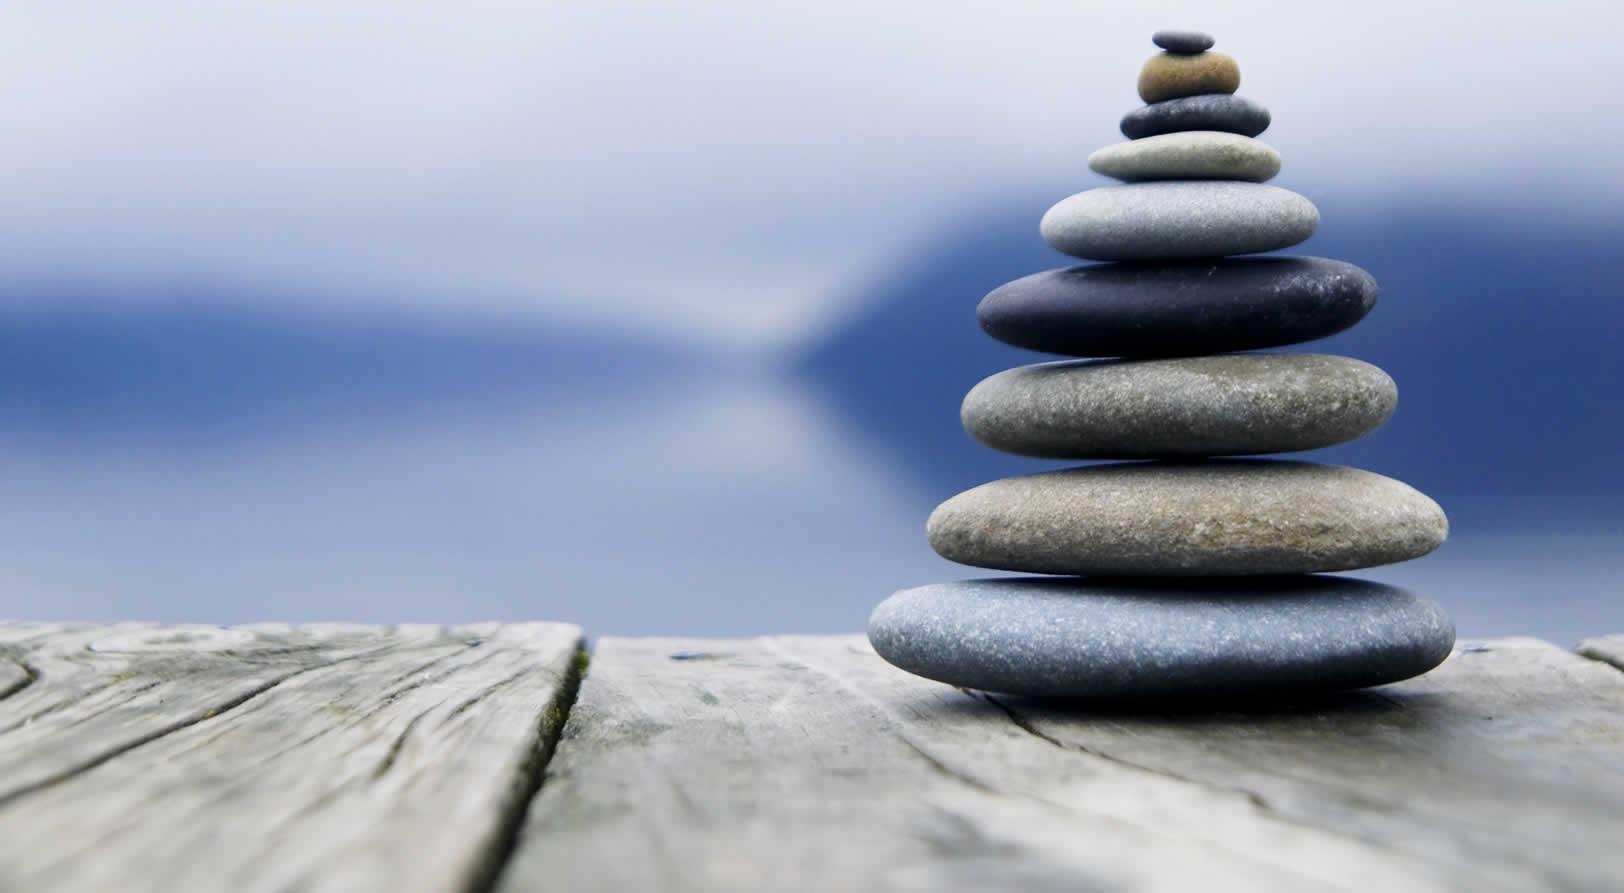 iPsychology | Σοφία Αντύπα | Ψυχοθεραπεία: Ατομική, ομαδική, οικογενειακή - ζεύγους